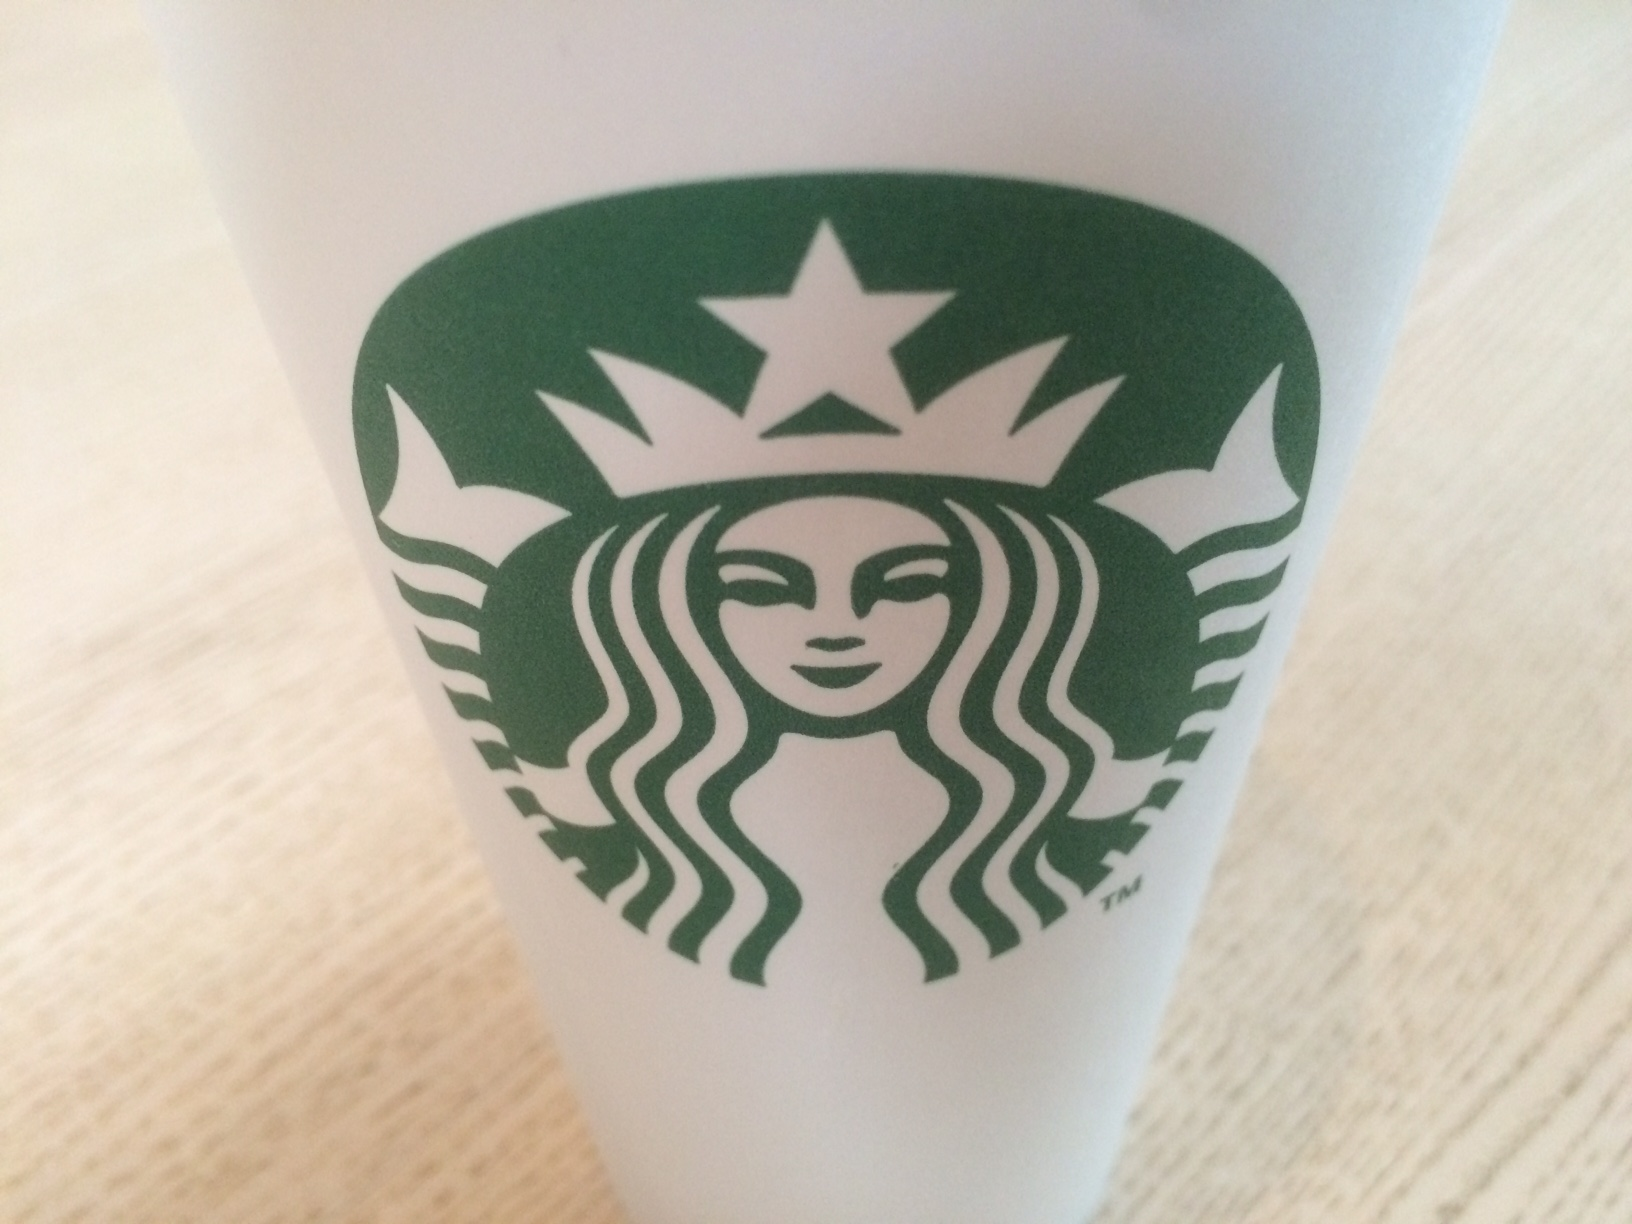 Starbucks logo coffee